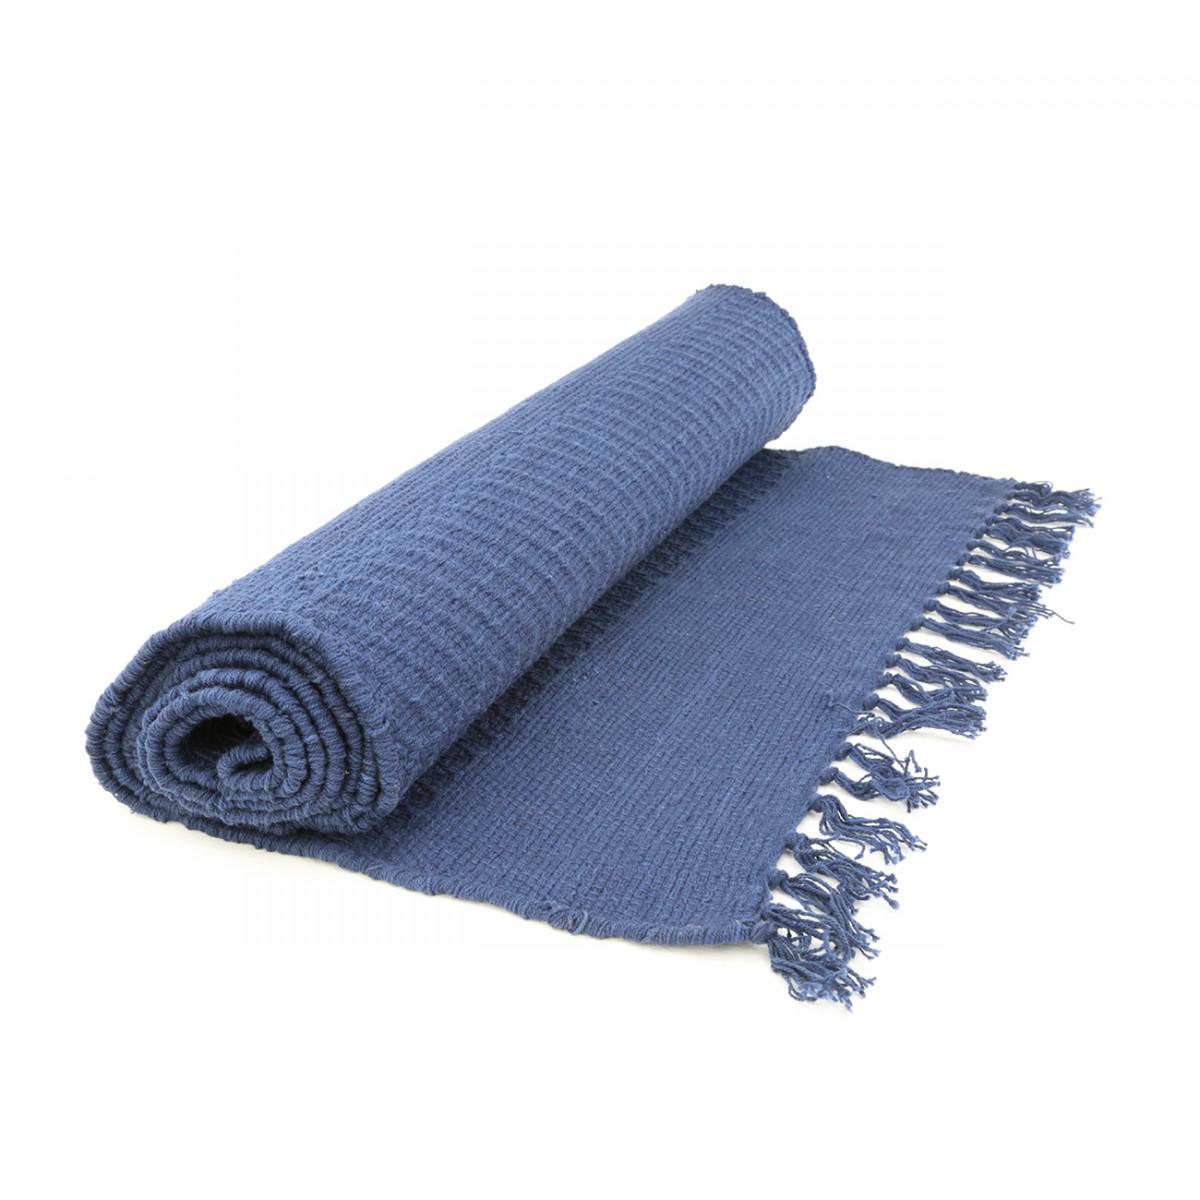 Rectangular Area Rug 9 x 6 Blue Cotton Cotton Rugs Cotton Rug Cotton Area Rug